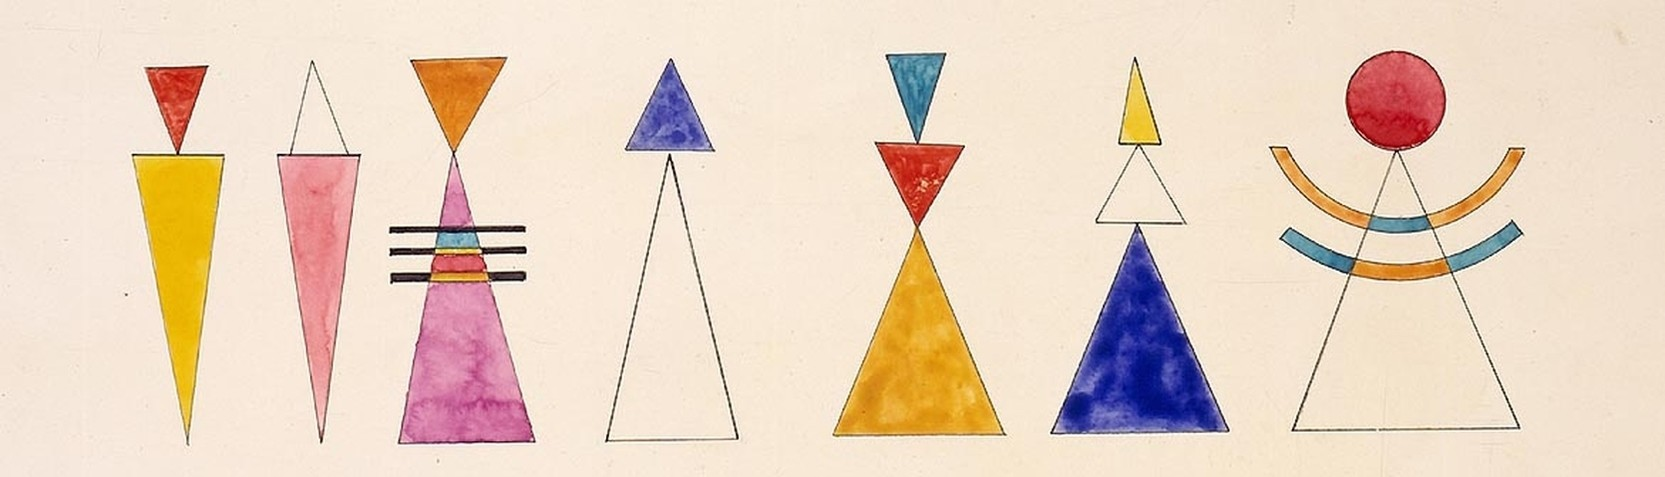 Künstler A-Z - Wassily Kandinsky